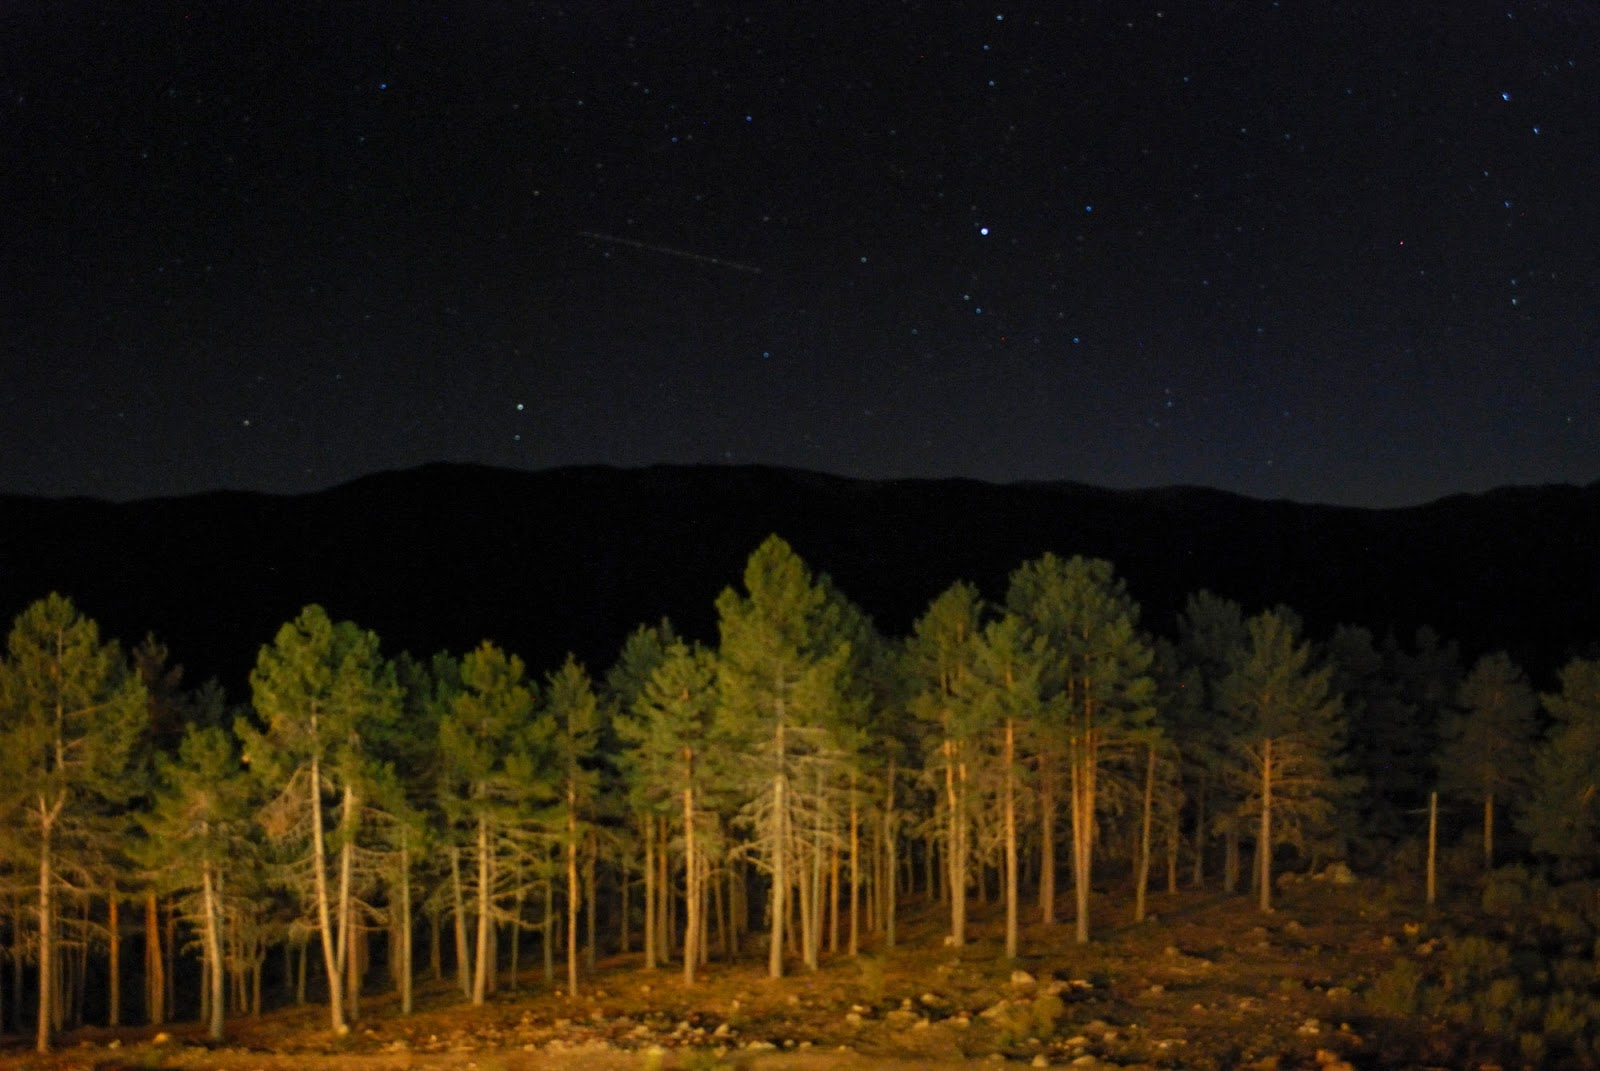 sierra parador gredos stars night astronomy estrellas astronomia